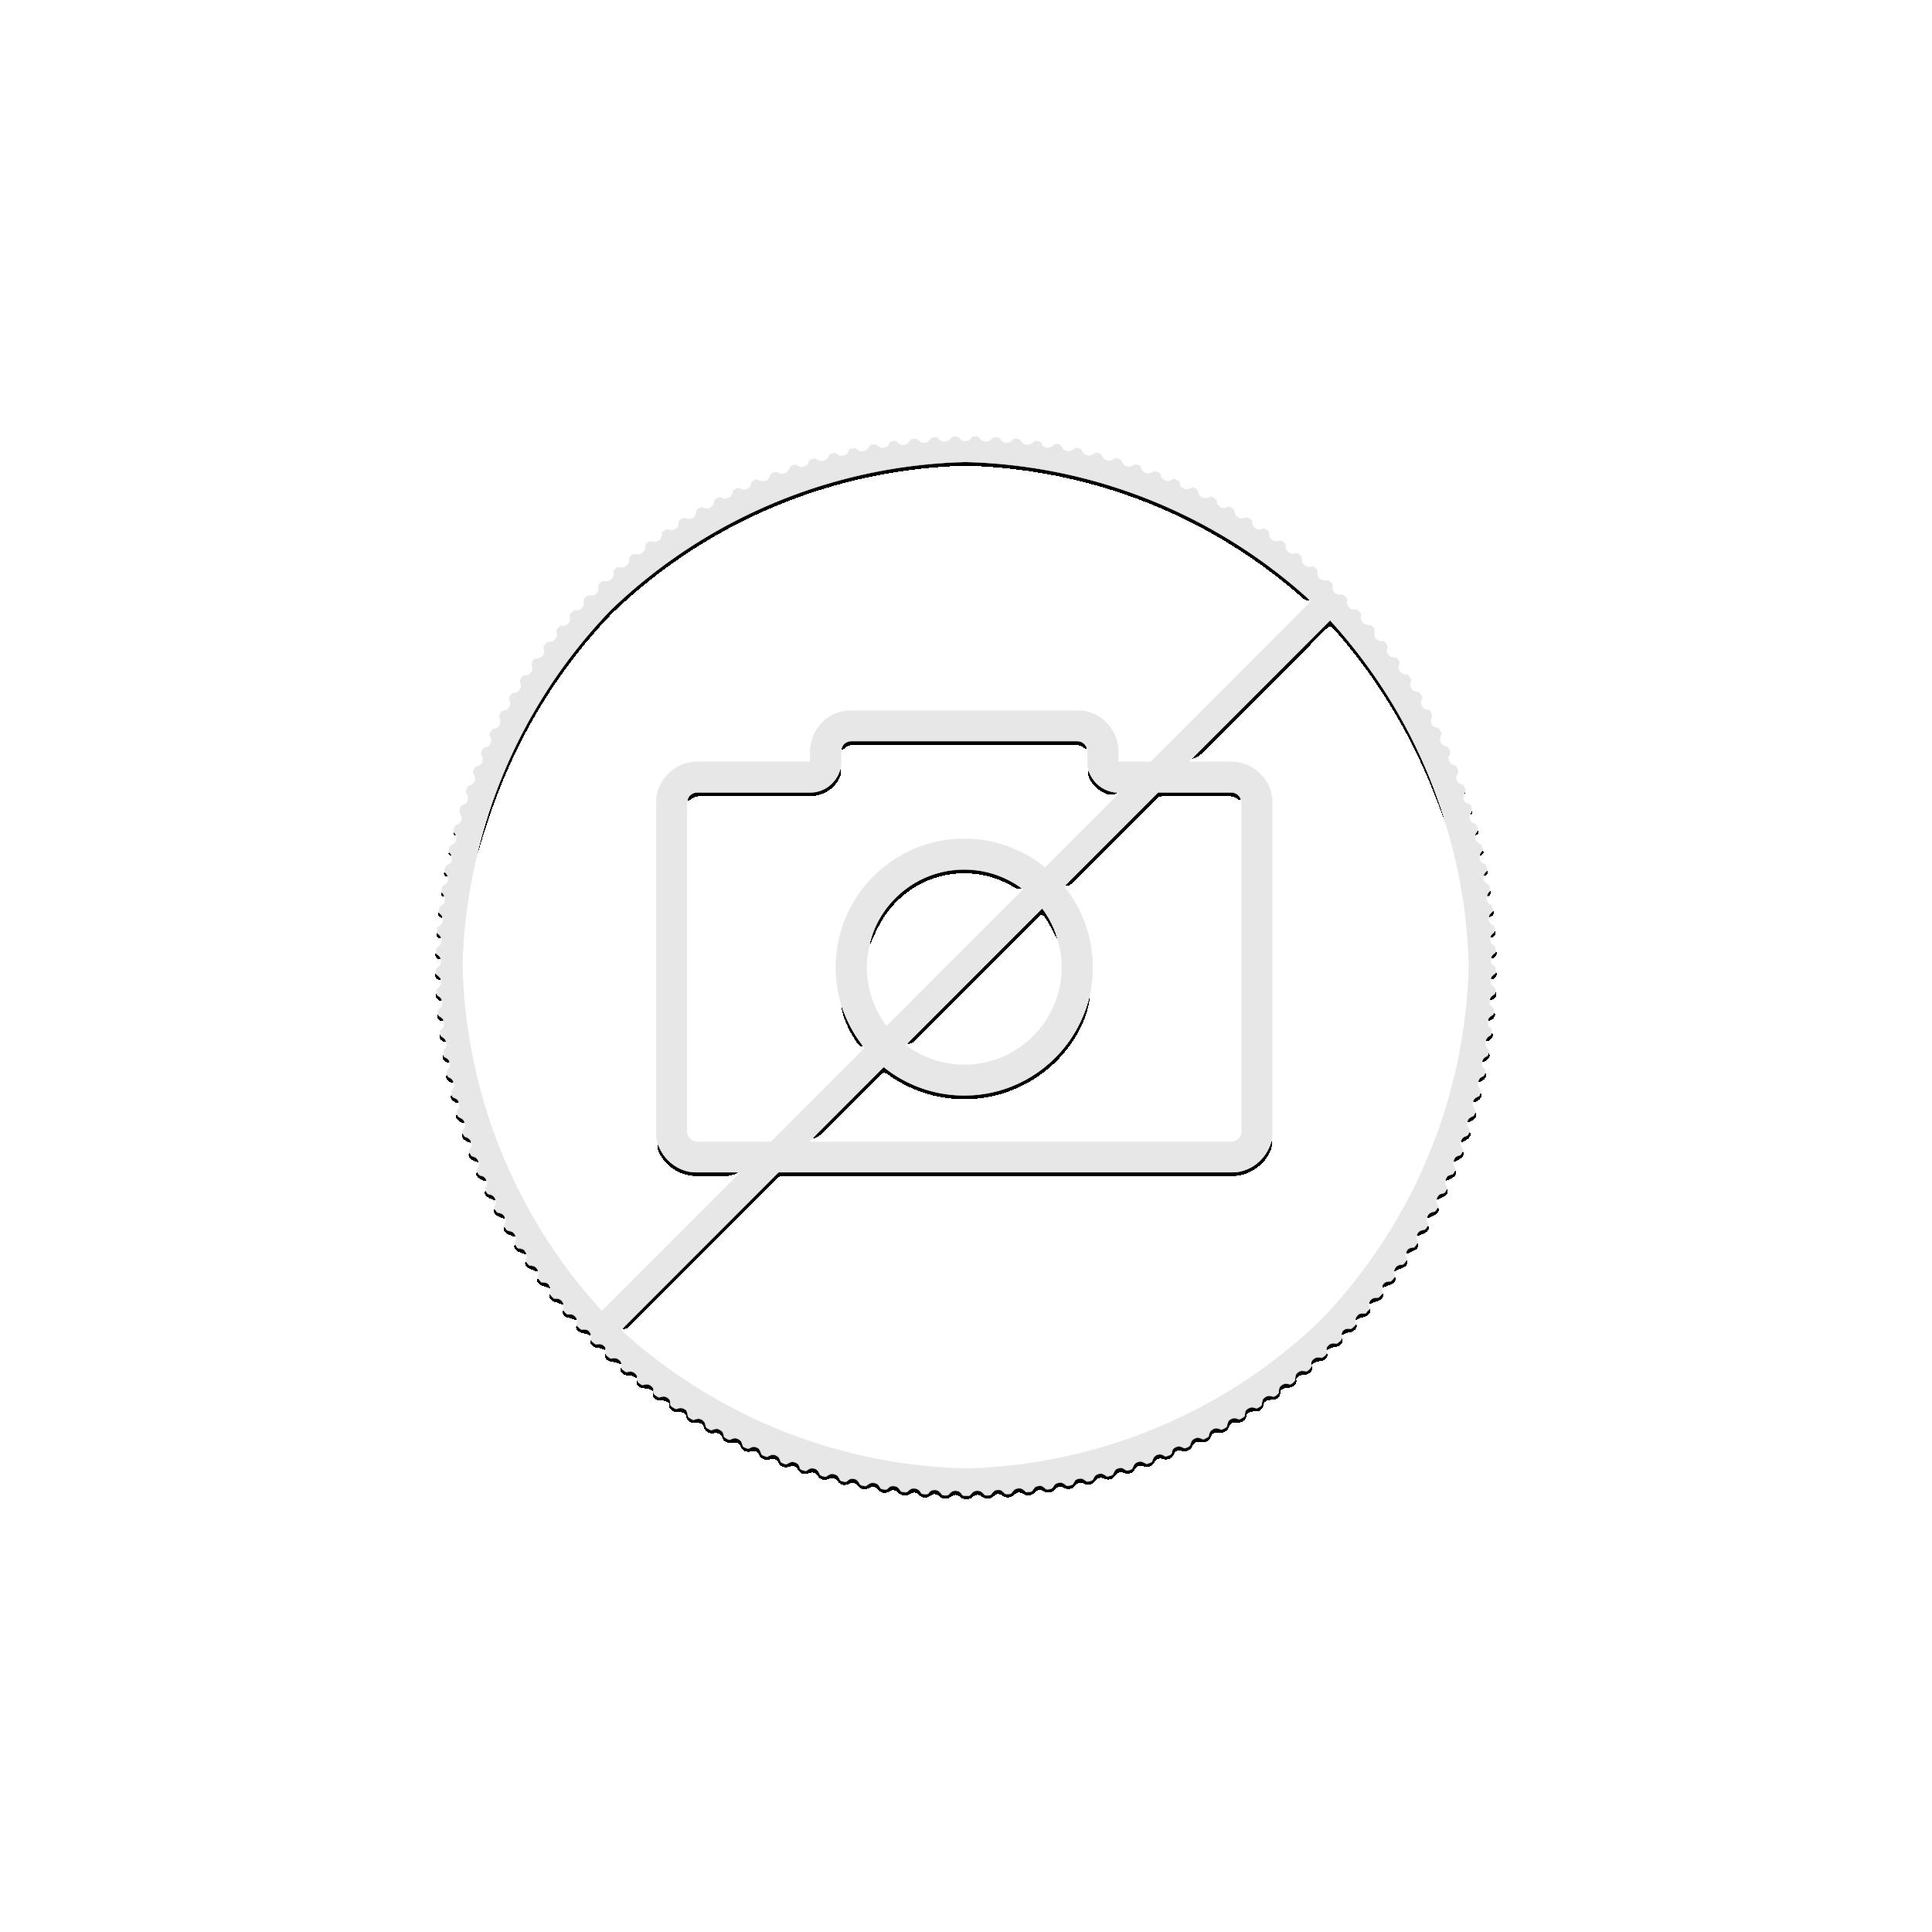 1 Troy ounce zilveren munt Lunar 2020 gekleurd